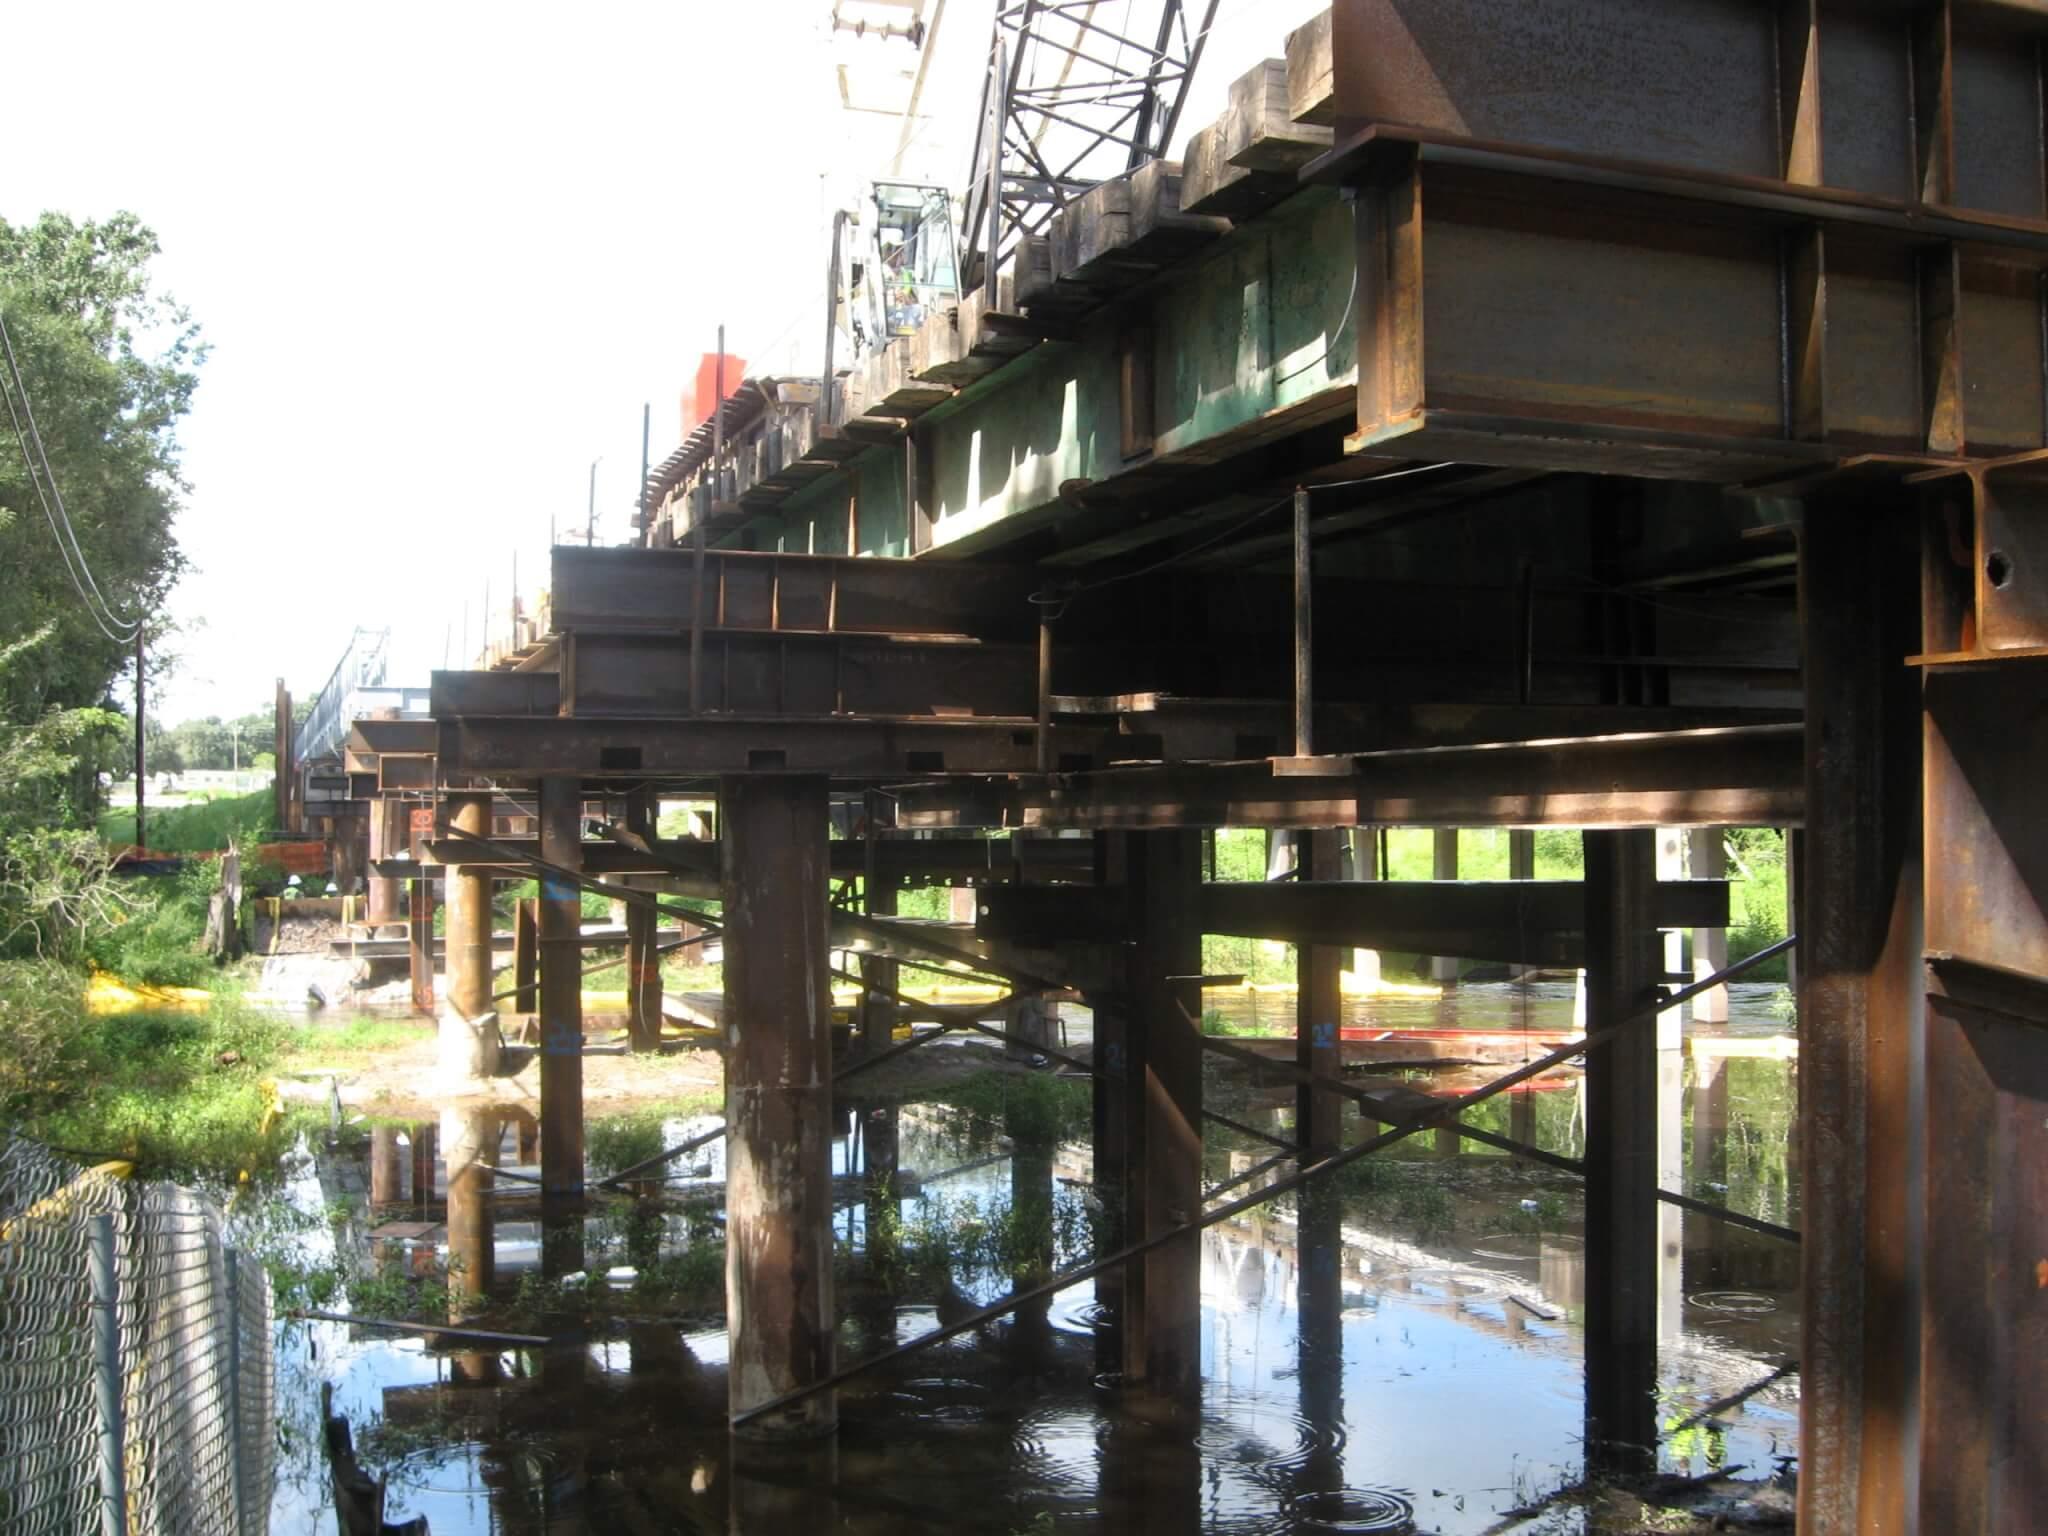 Alafia River Bridge